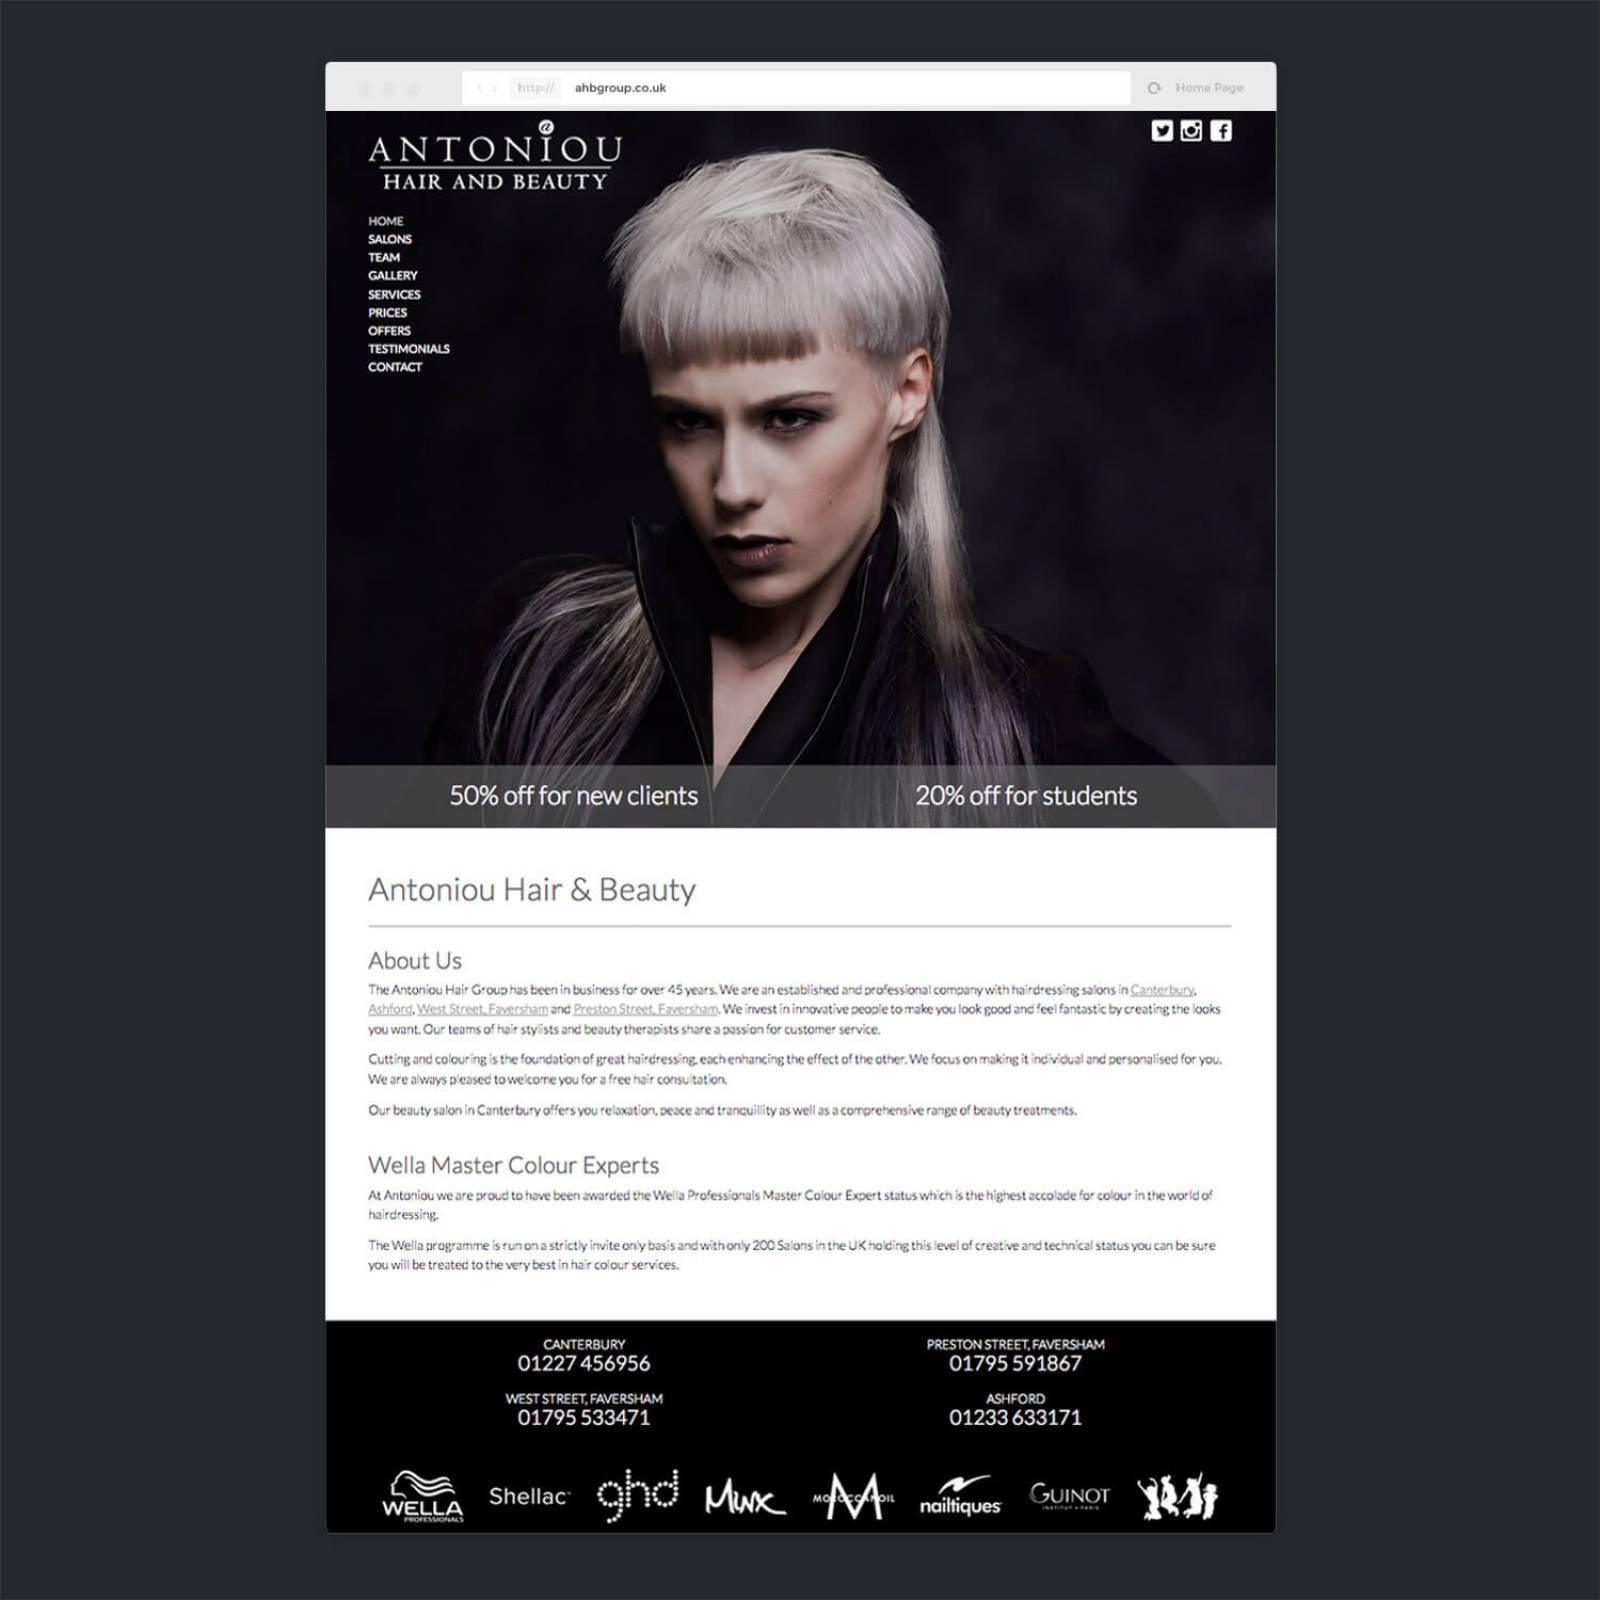 Antoniou-website-design-agency-graphic-design-canterbury.jpg